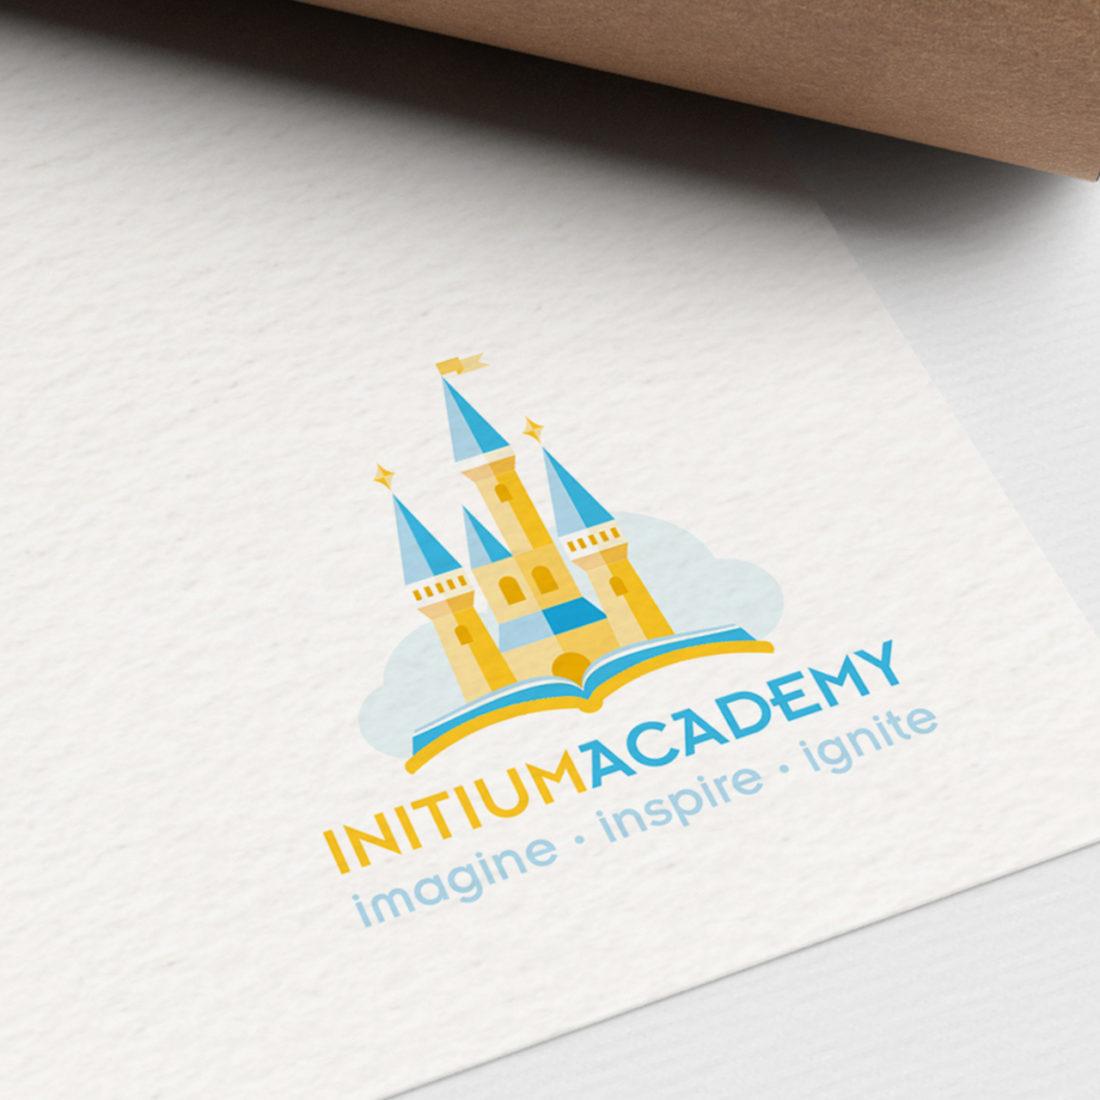 Initium Academy logo design brand strategy